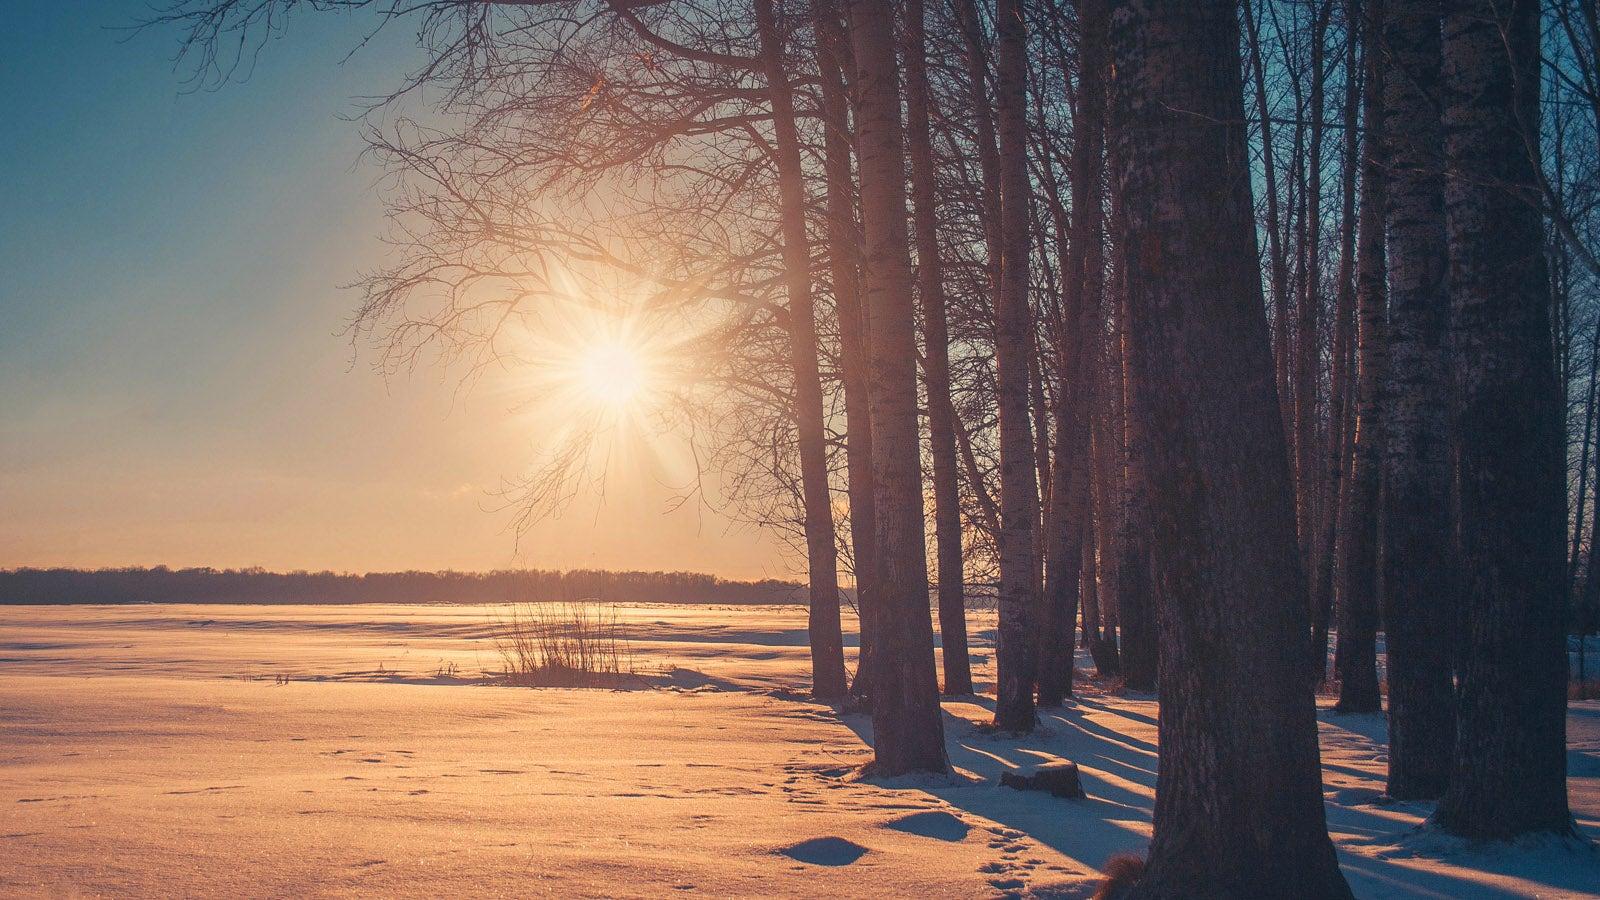 winter-sunset-winter-solstice-poem-sean-o-brien.jpg